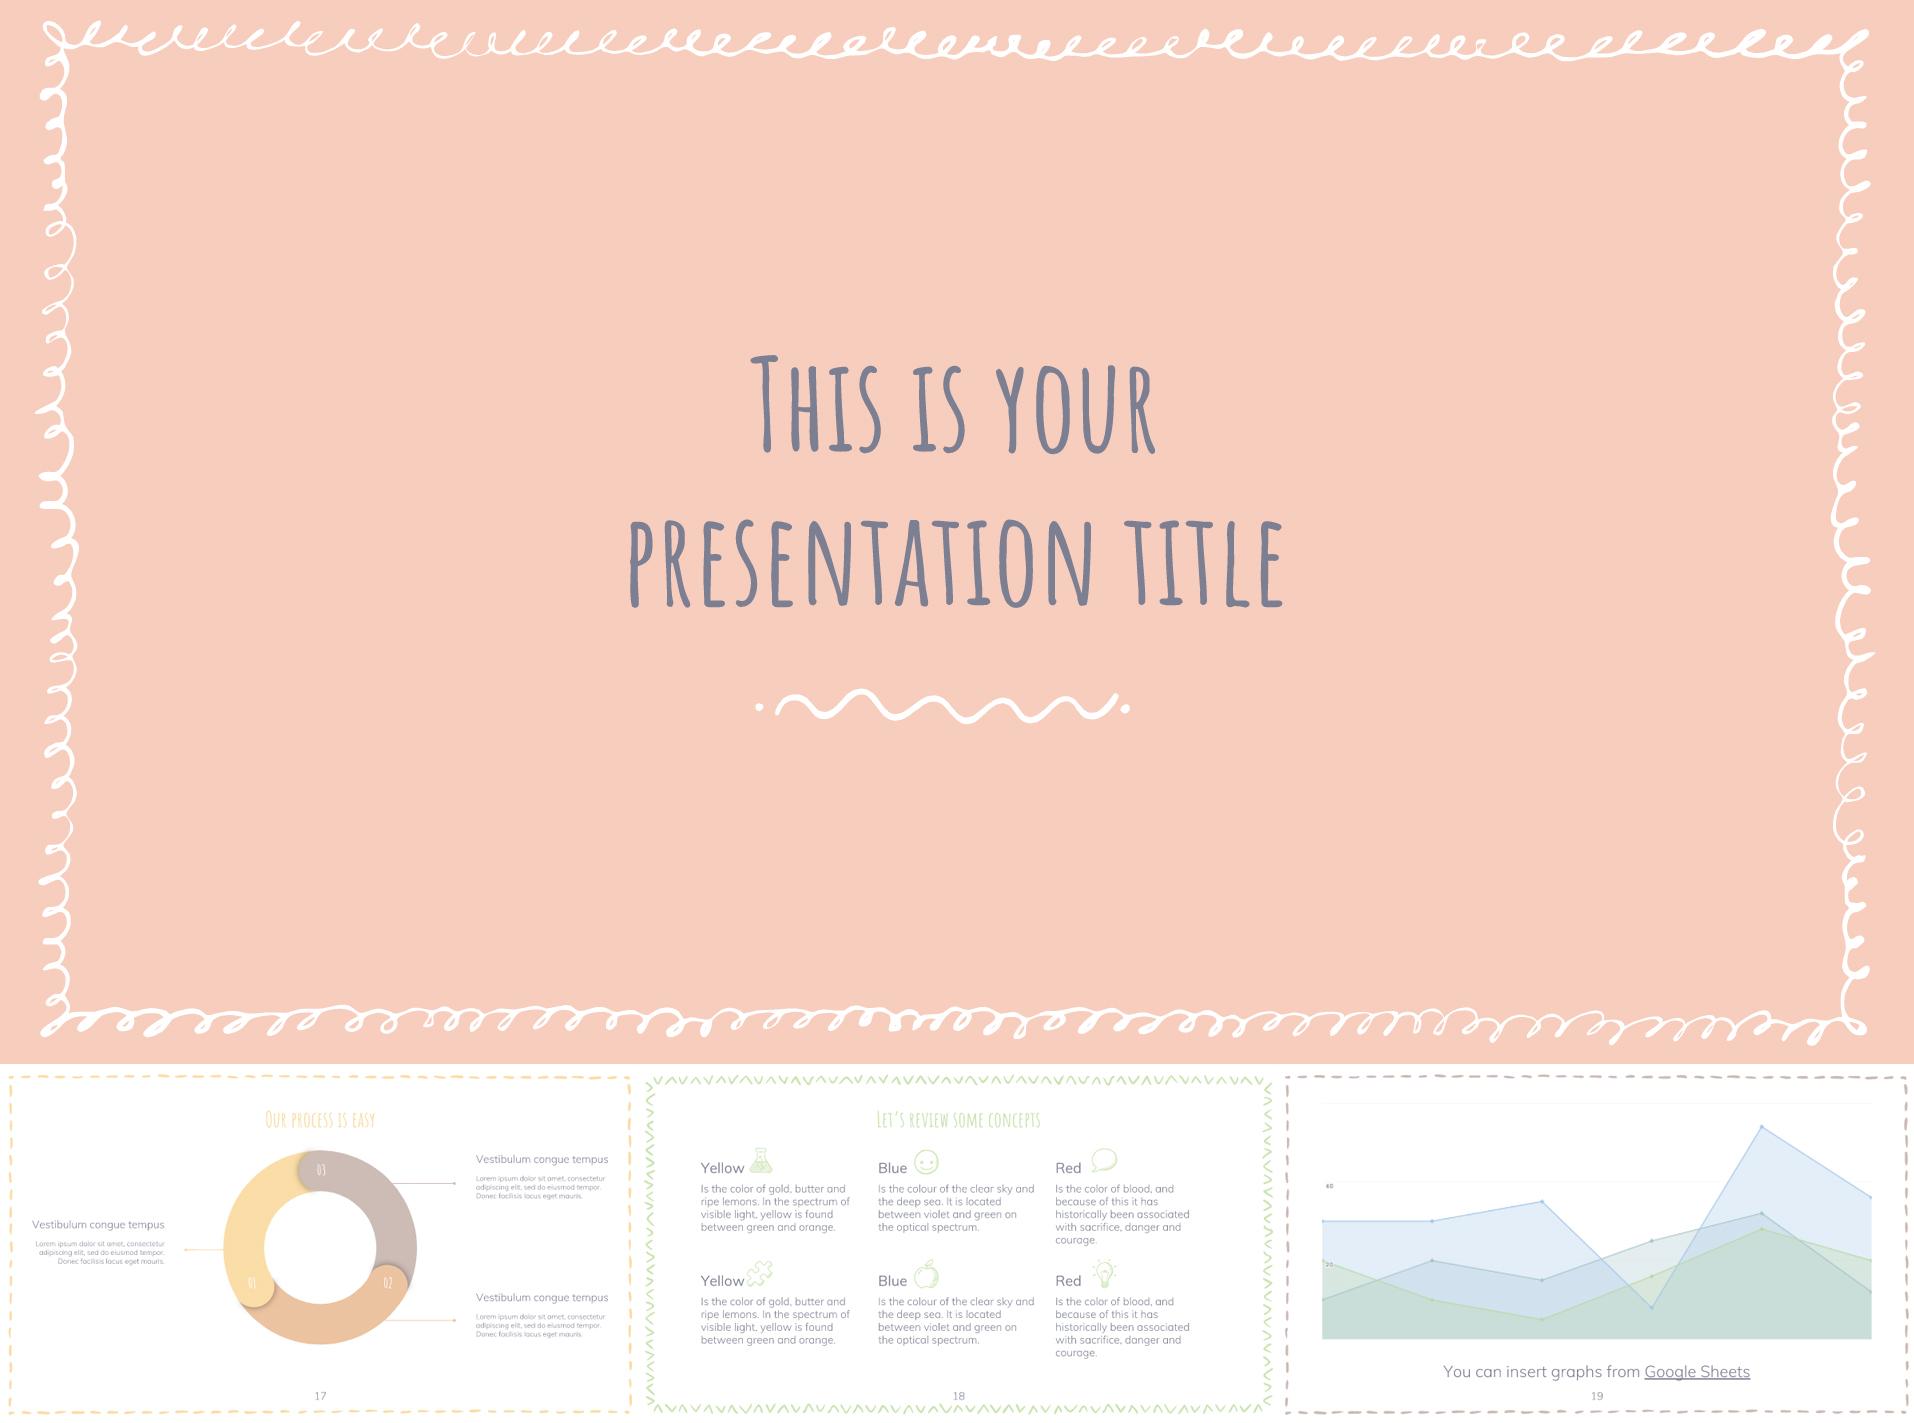 Google Slides Template in Pastel Color Scheme - The Internet Tips